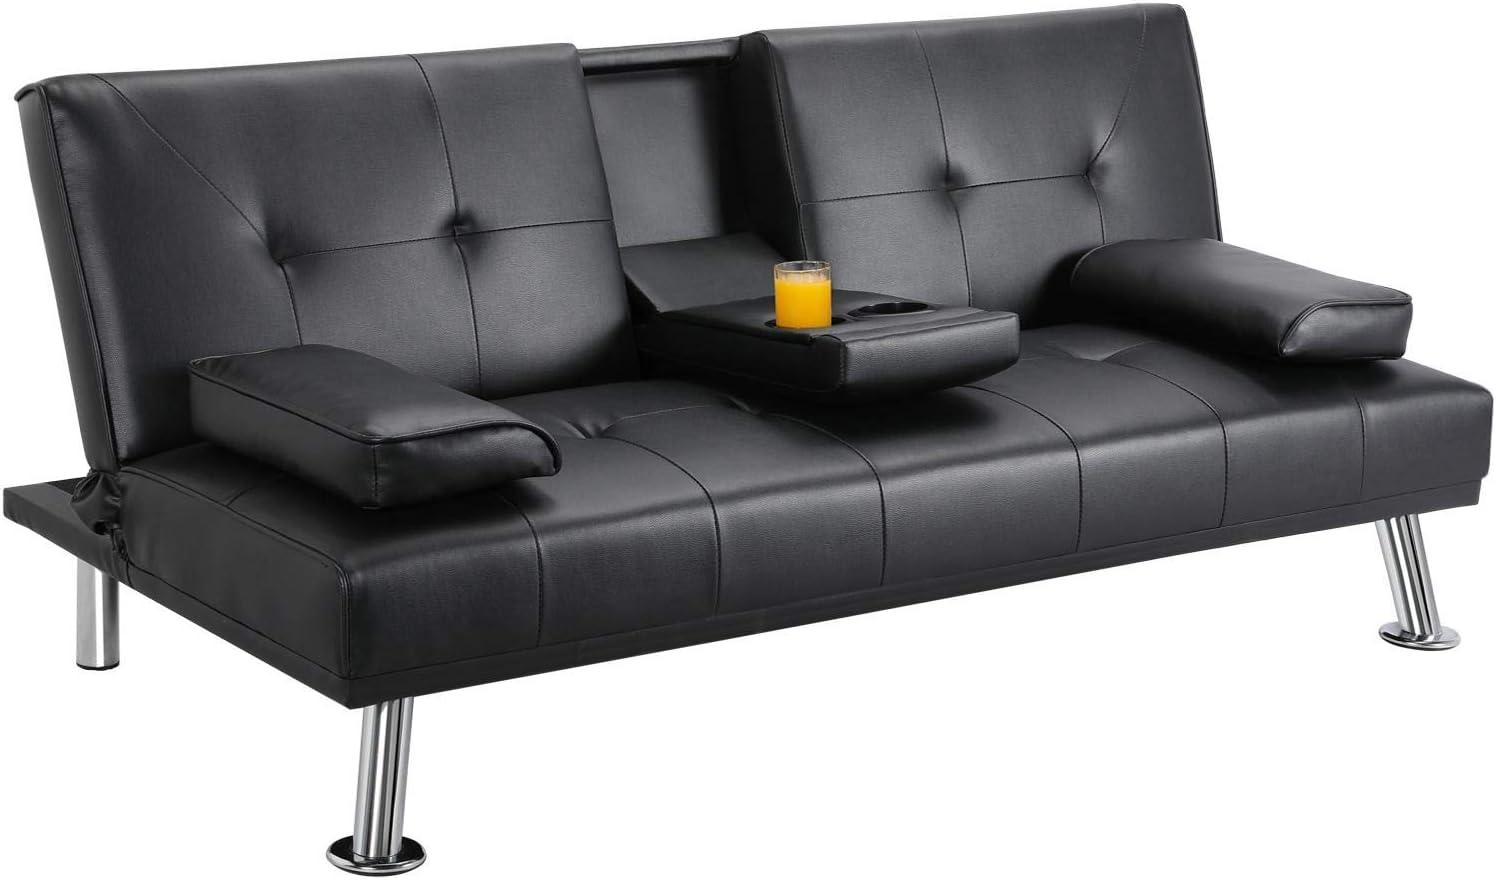 - Amazon.com: YAHEETECH Leather Futon Couch Futon Sofa Bed Modern